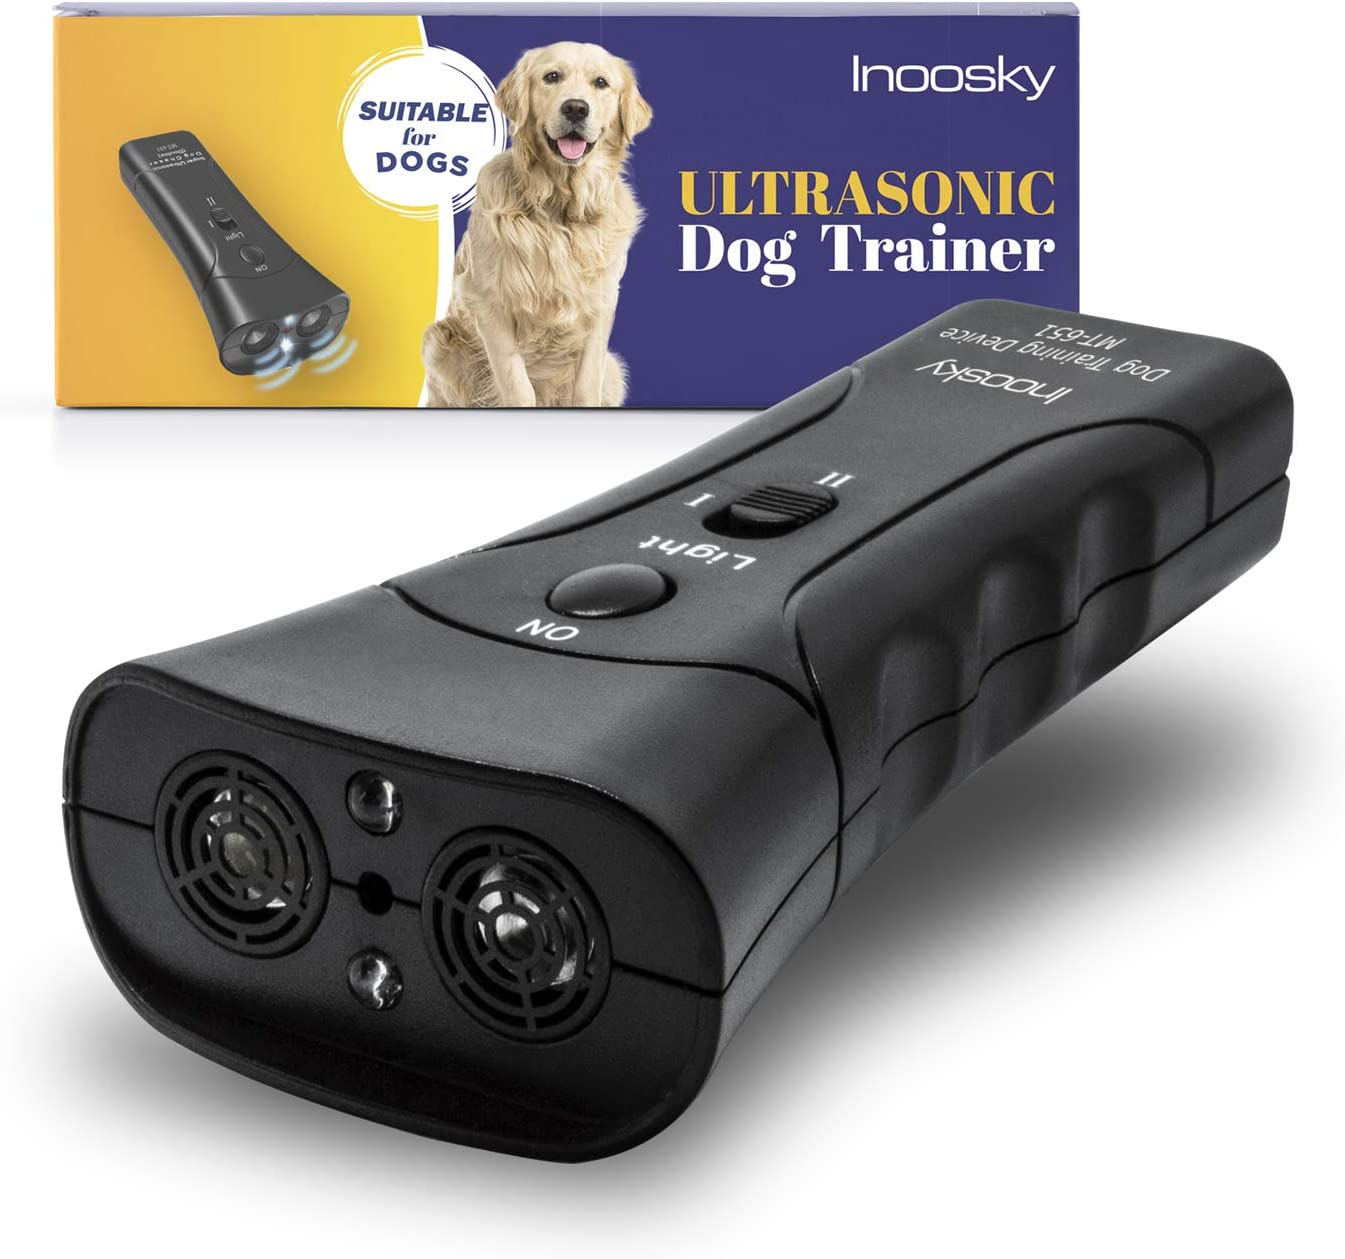 Inoosky Anti Barking Handheld Barxbuddy Ultrasonic Dog Trainer Device - Electronic Dog Deterrent/Training Tool/Stop Barking